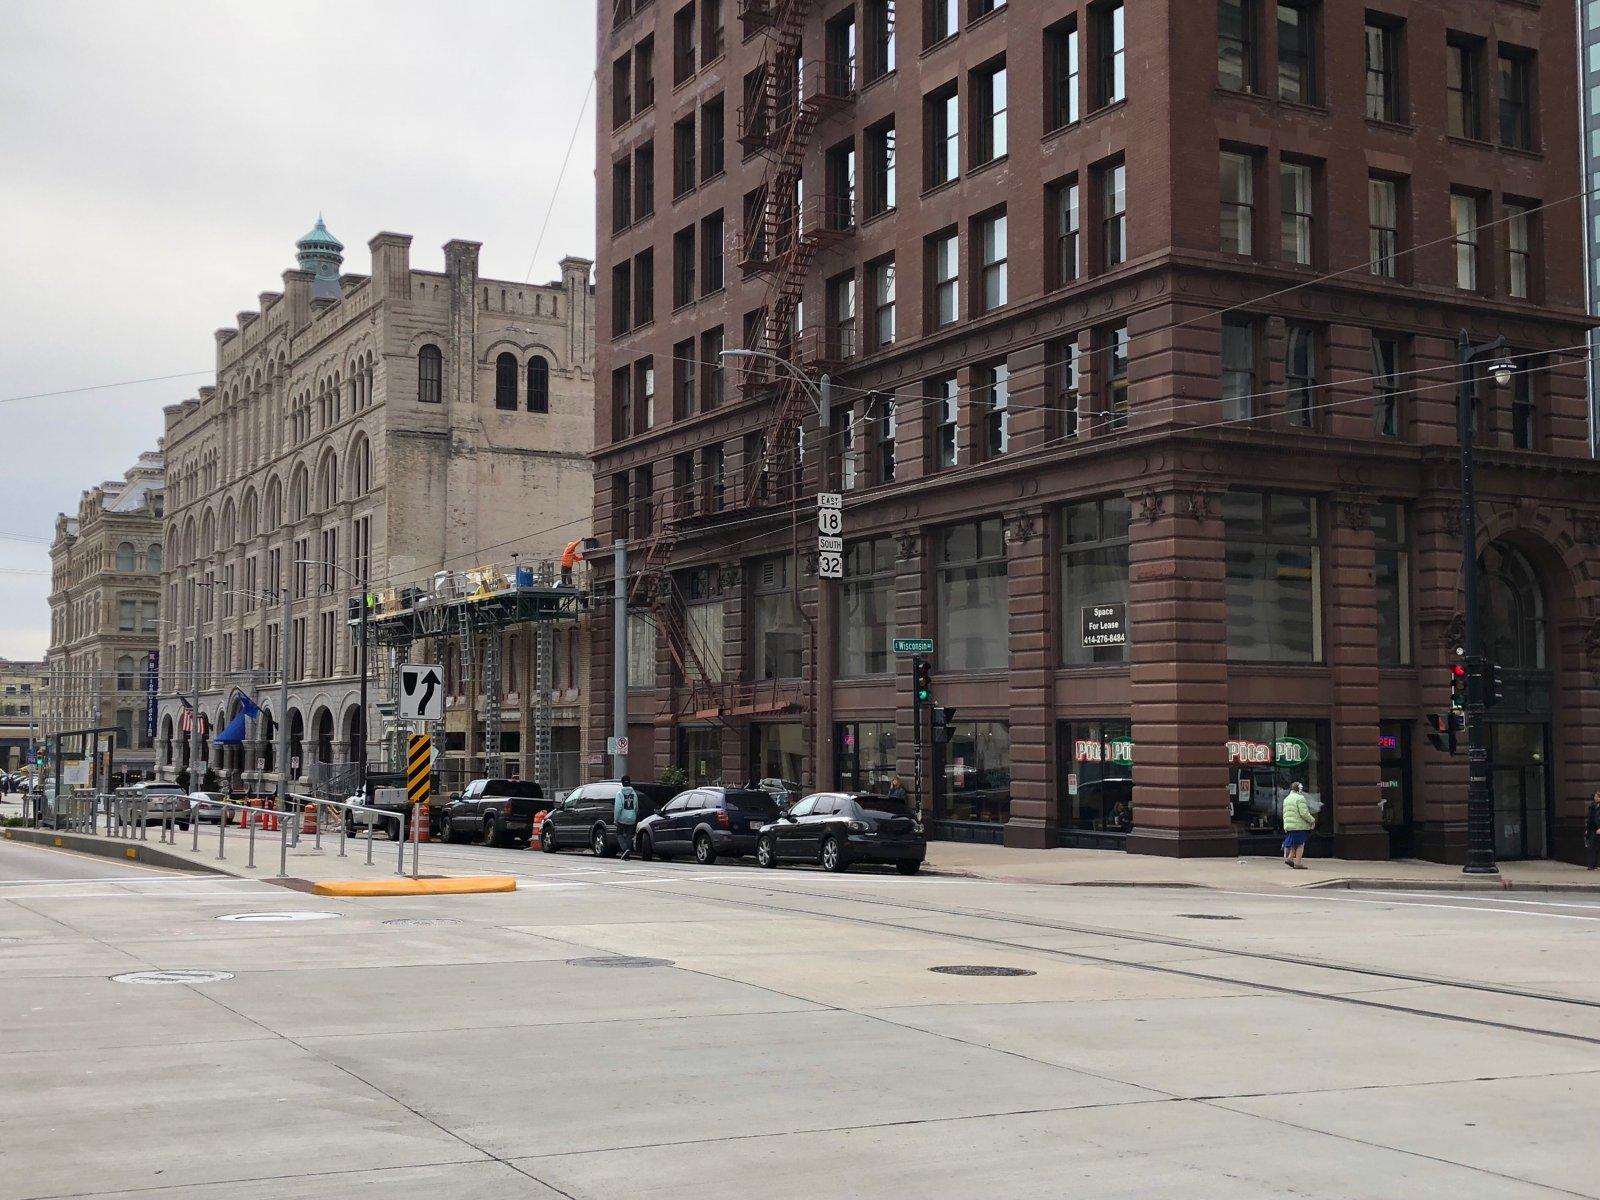 627-637 N. Broadway Facade Installation